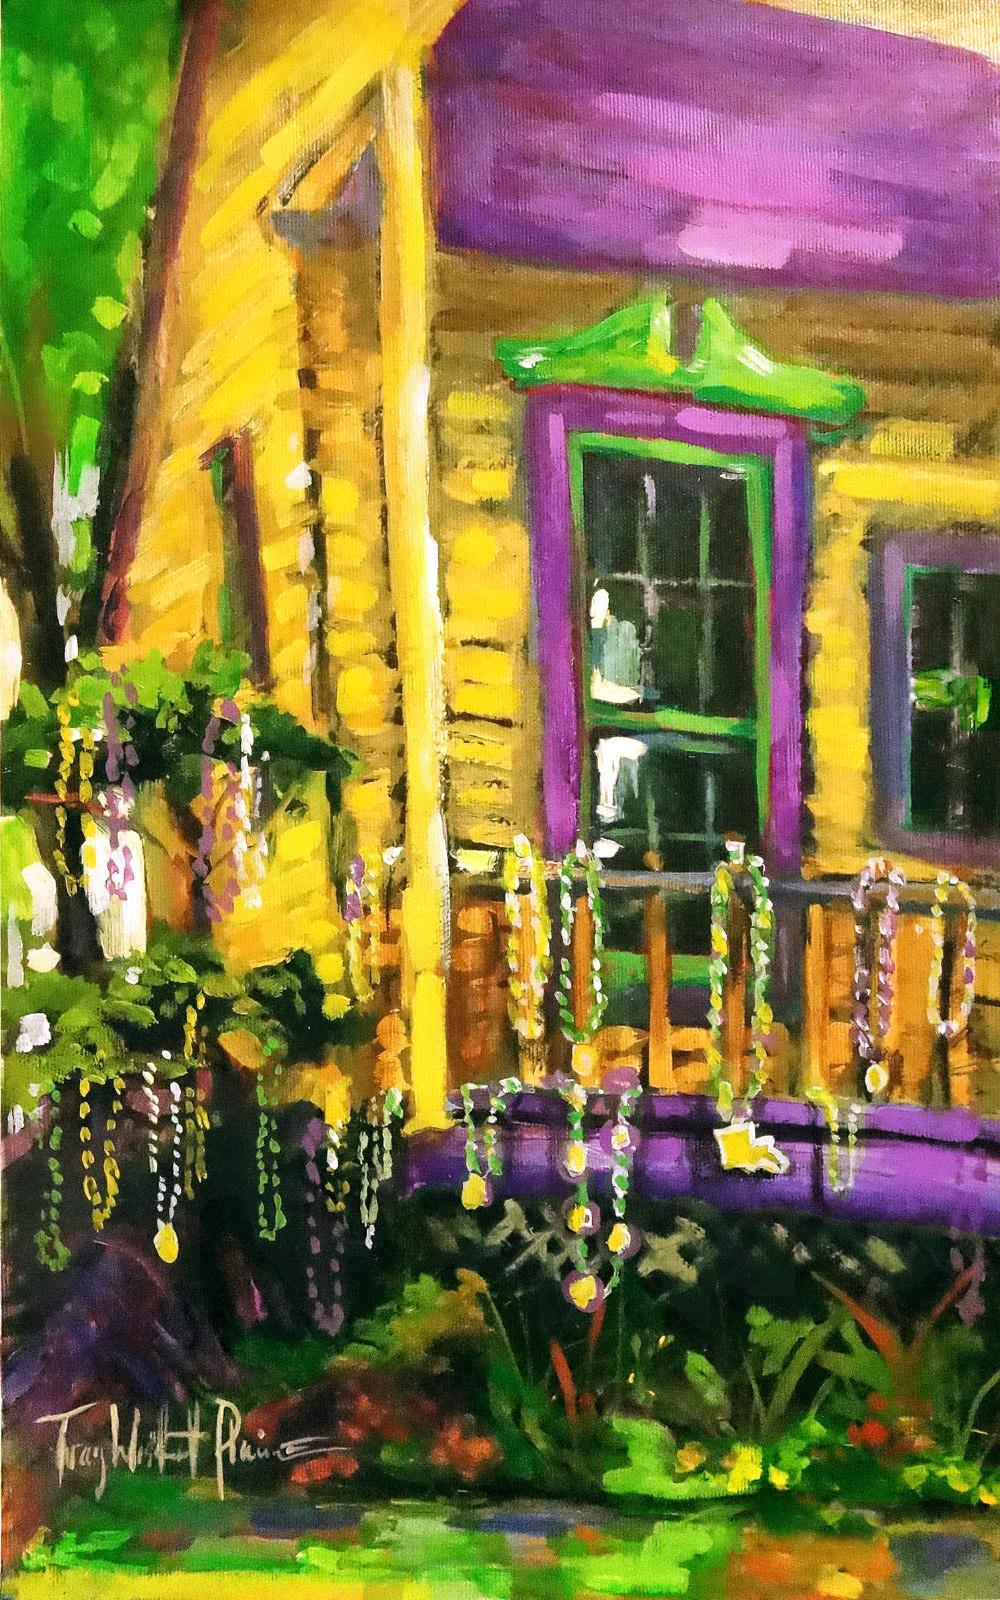 Lsu purple MG house copy.jpg